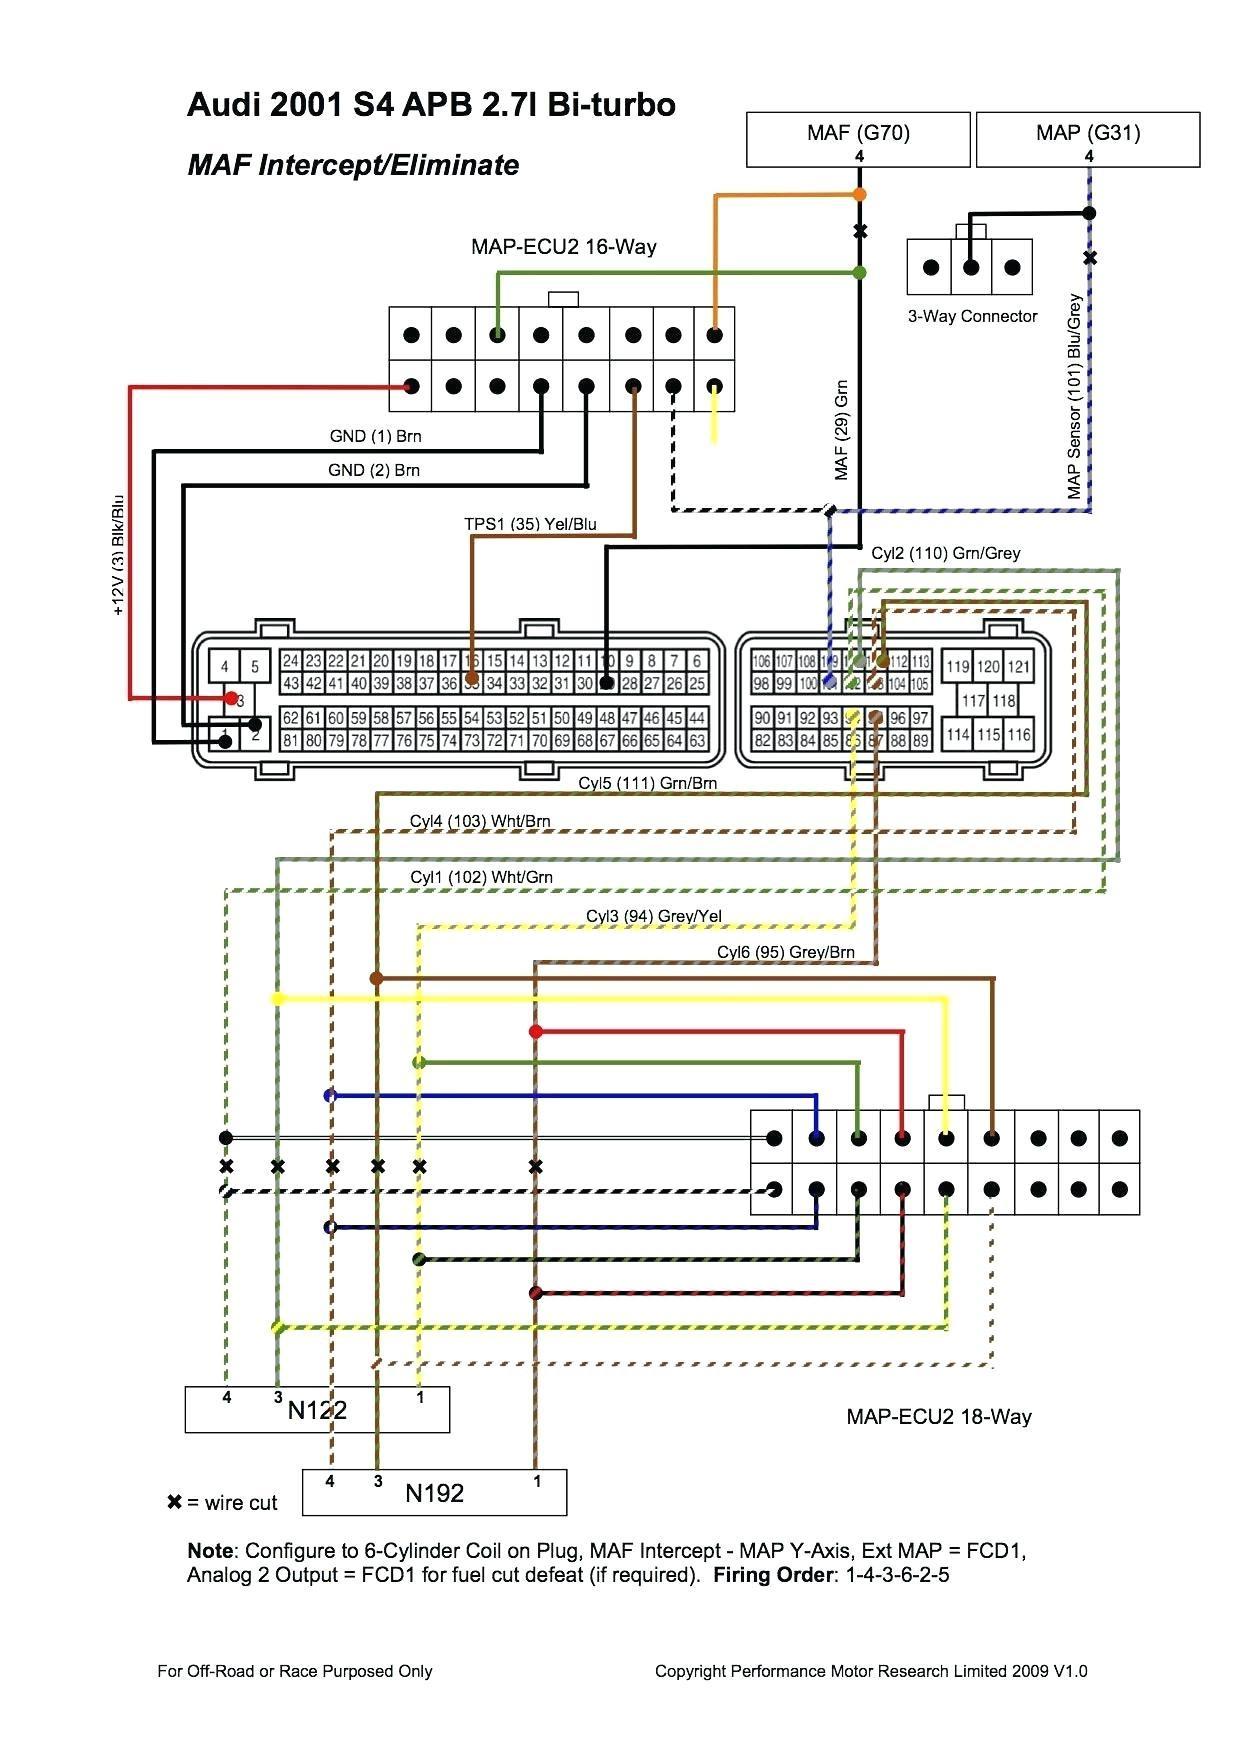 1990 dodge dakota fuse box diagram wiring schematic wiring diagram 1988 dodge dakota wiring diagram